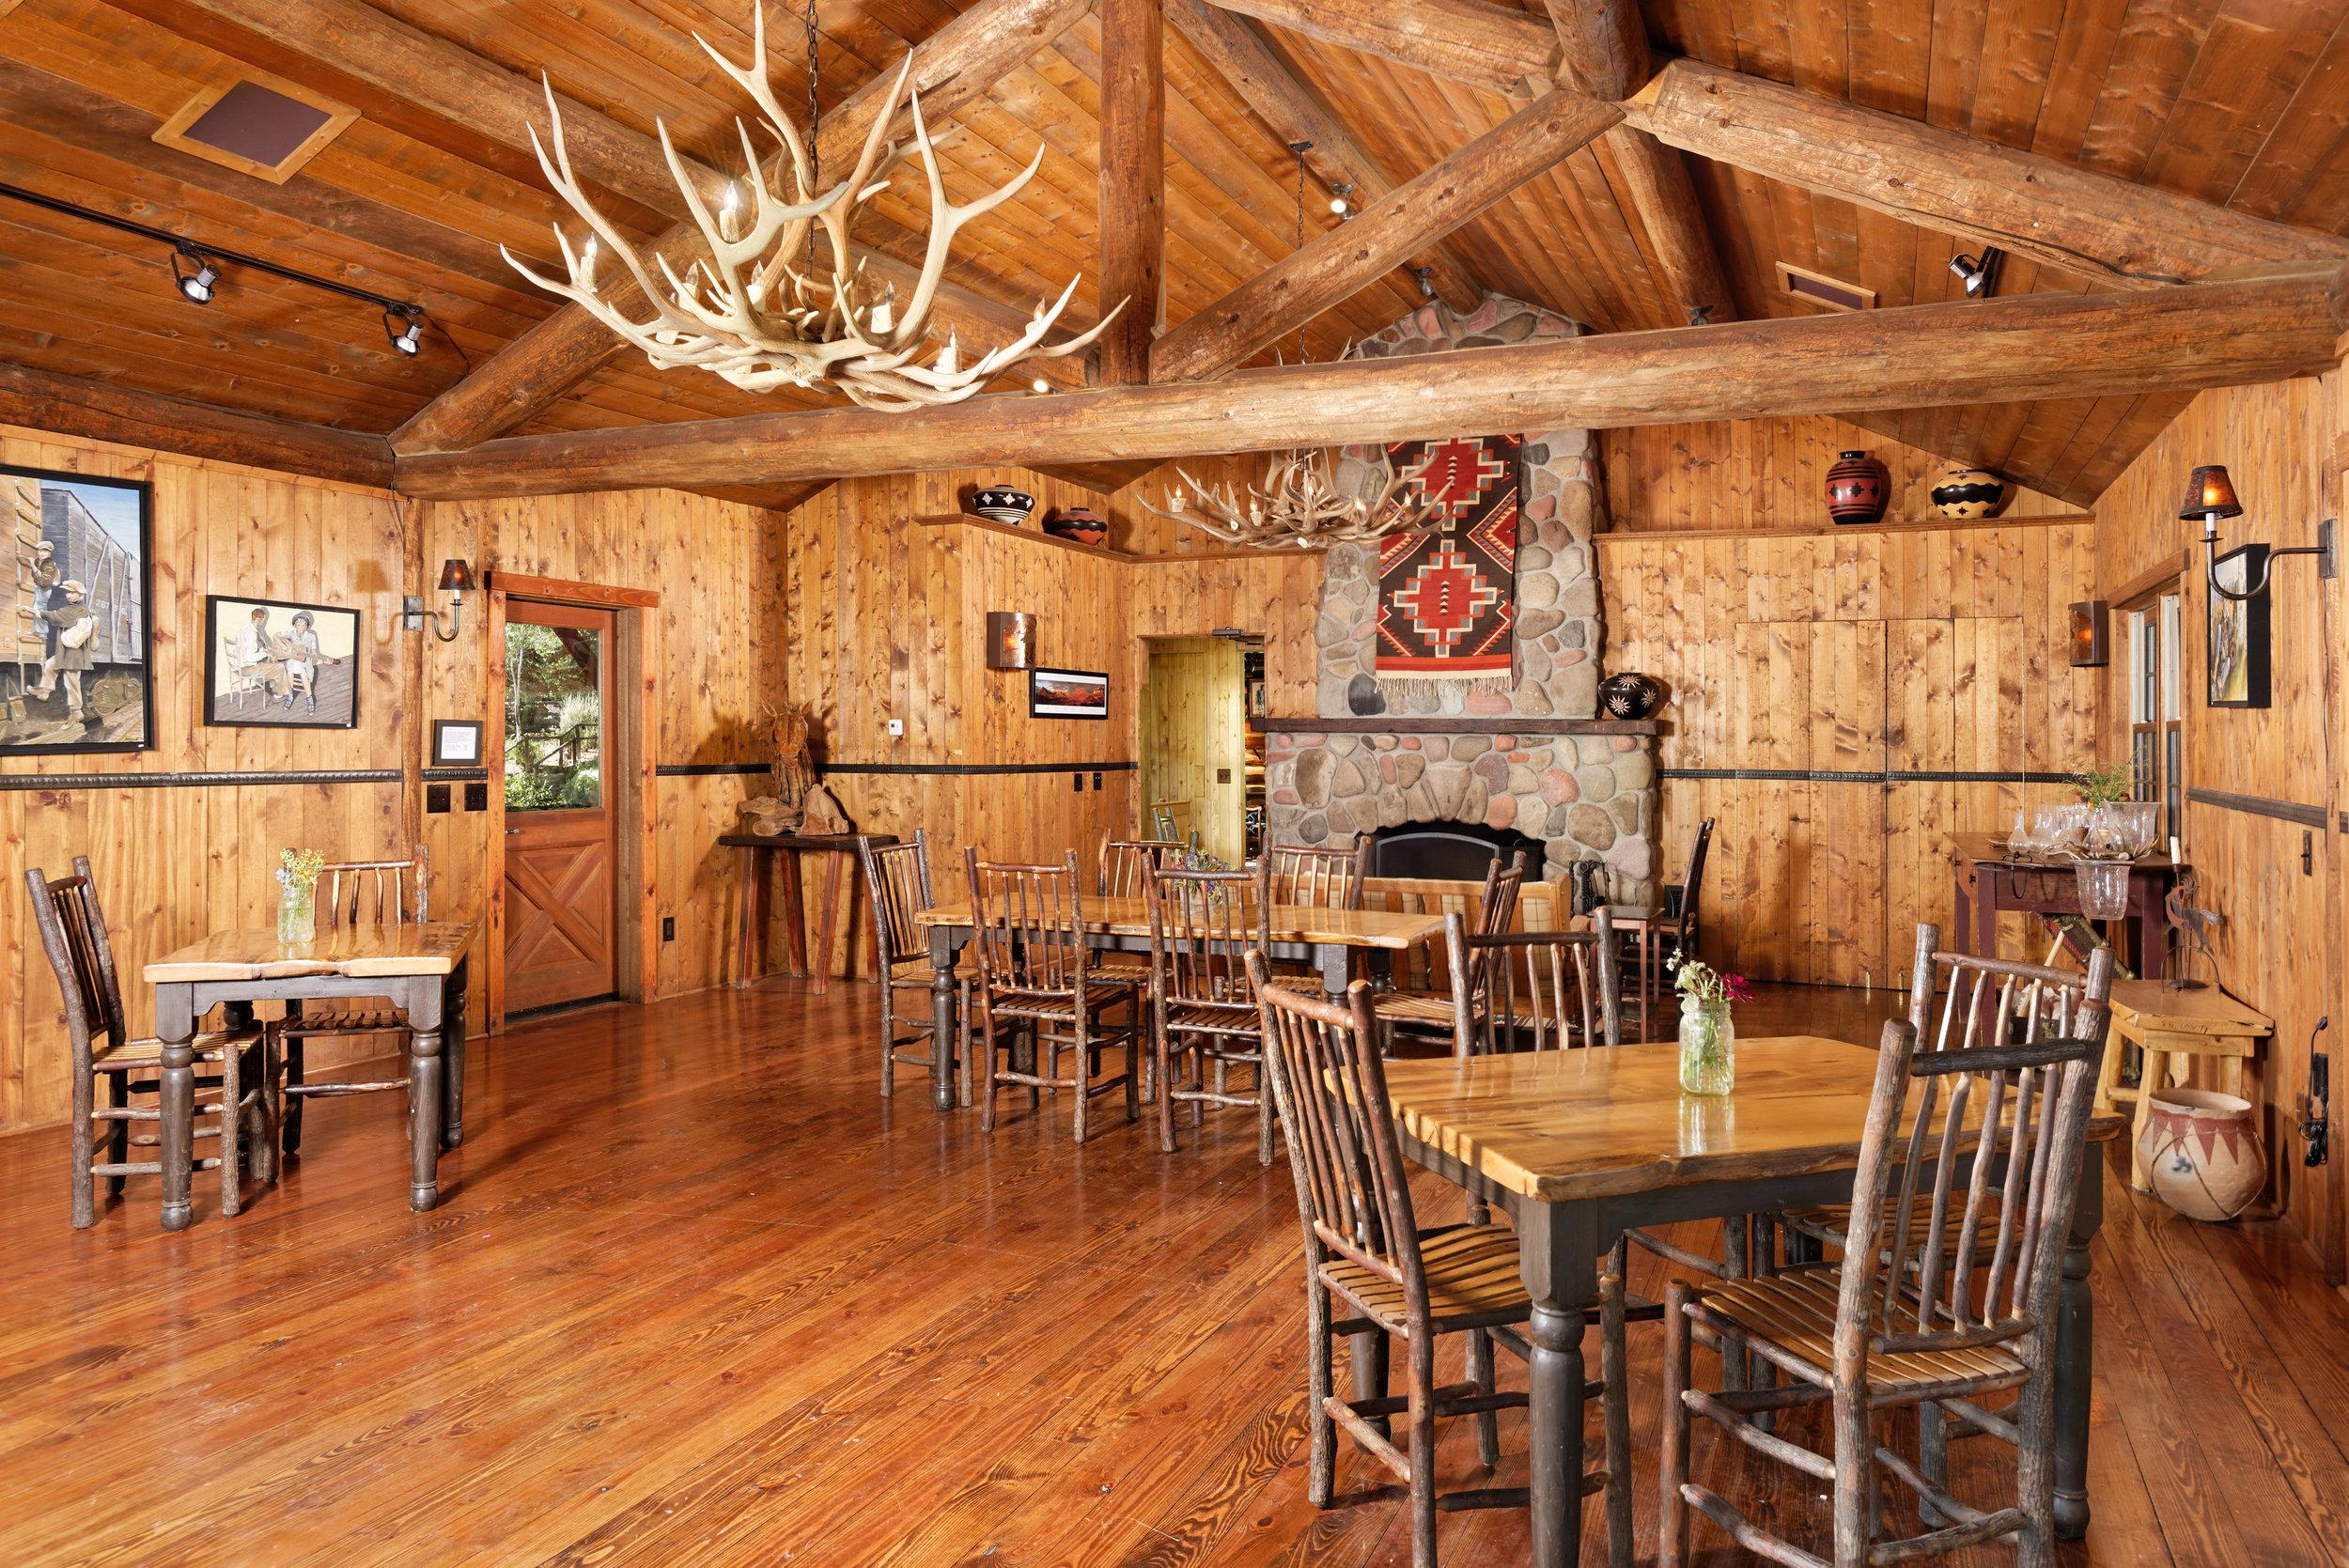 Fireside Room Adjoining Old Elk Lodge